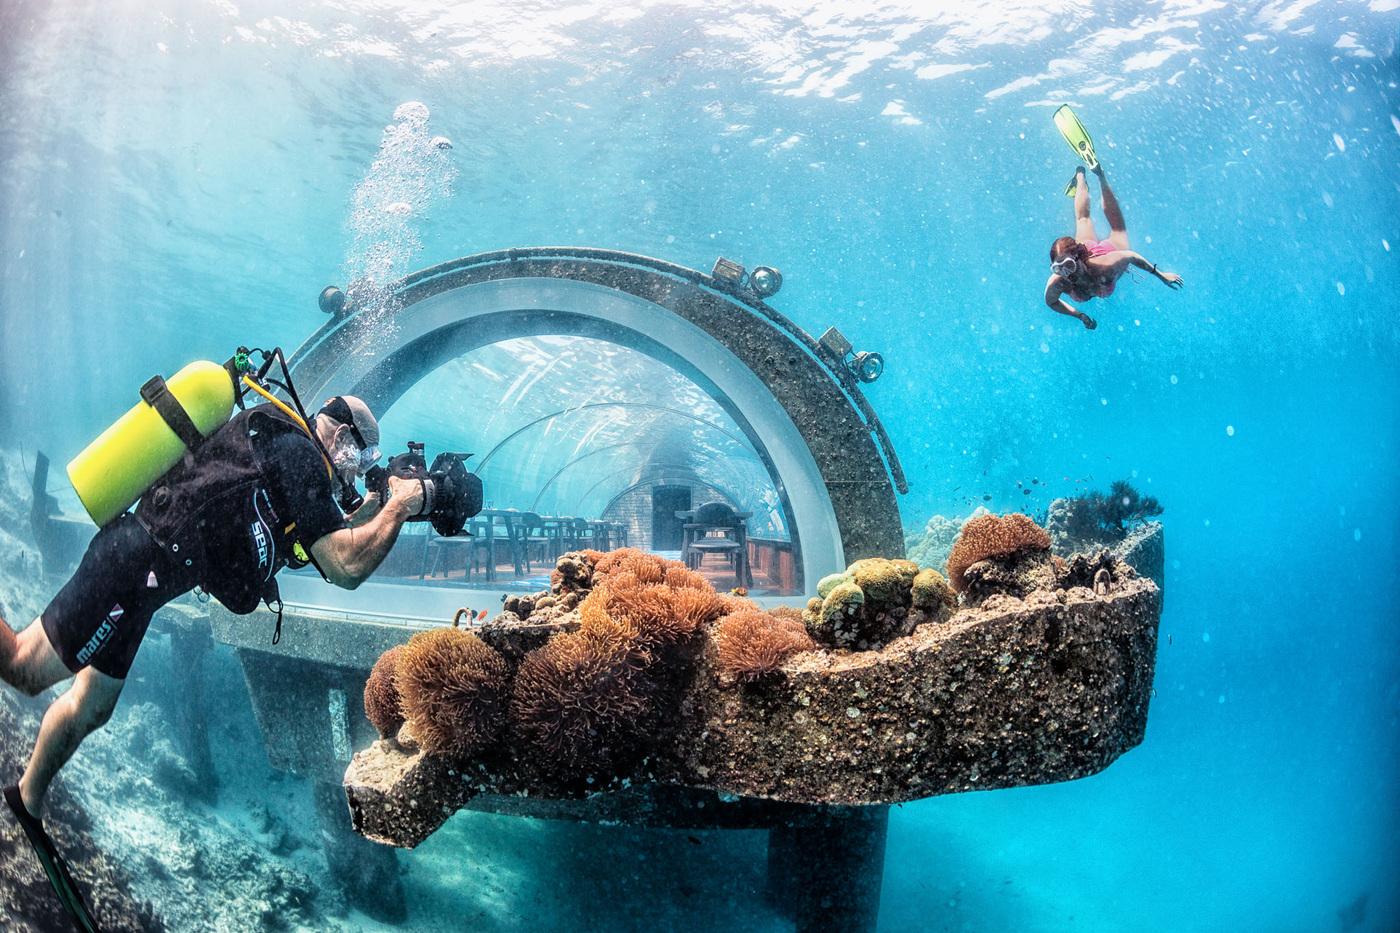 Jesper Anhede - Underwater photography